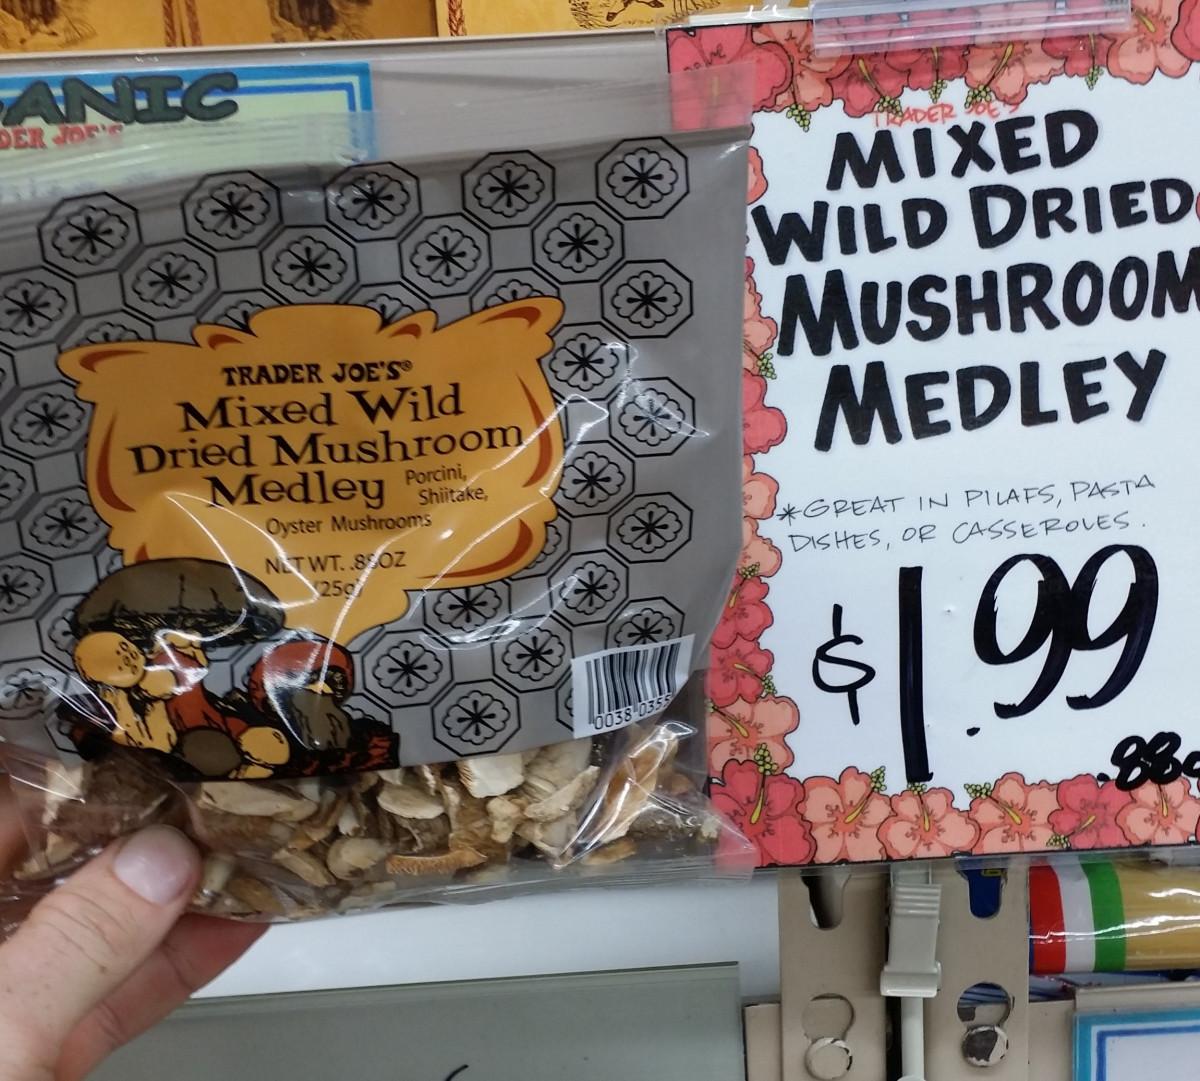 Dried Porcini Mushrooms Trader Joe'S  Trader Joe's Mixed Wild Dried Mushroom Medley